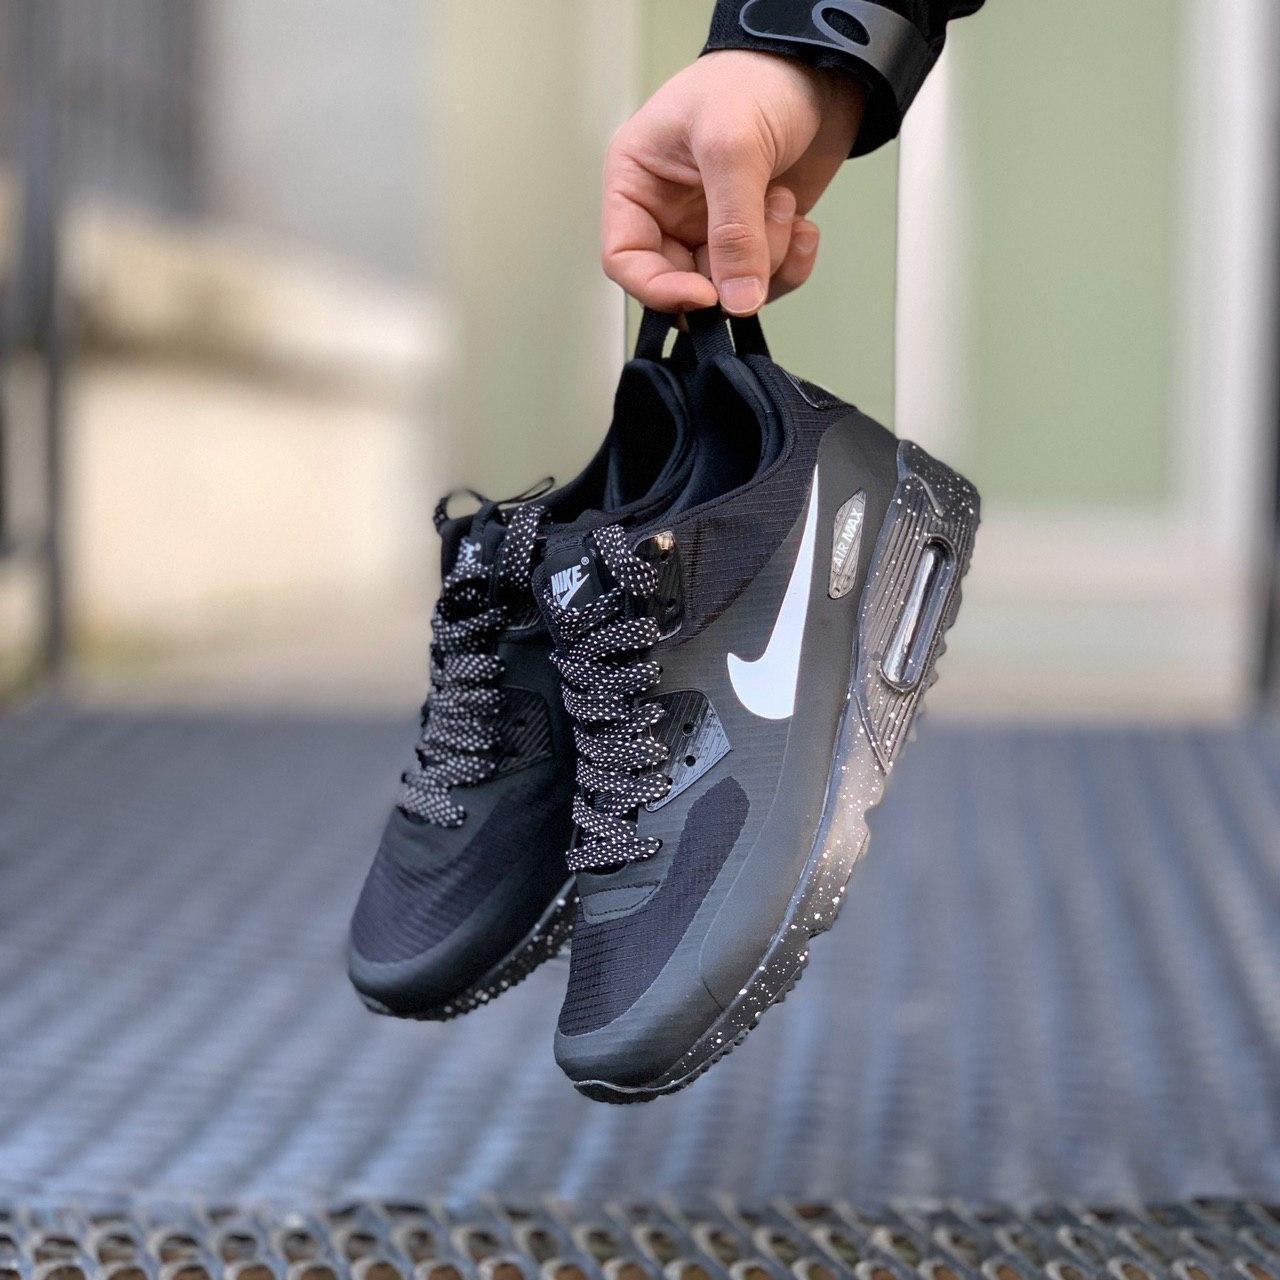 Кроссовки мужские зимние  Nike Air Max 90 Winter Black